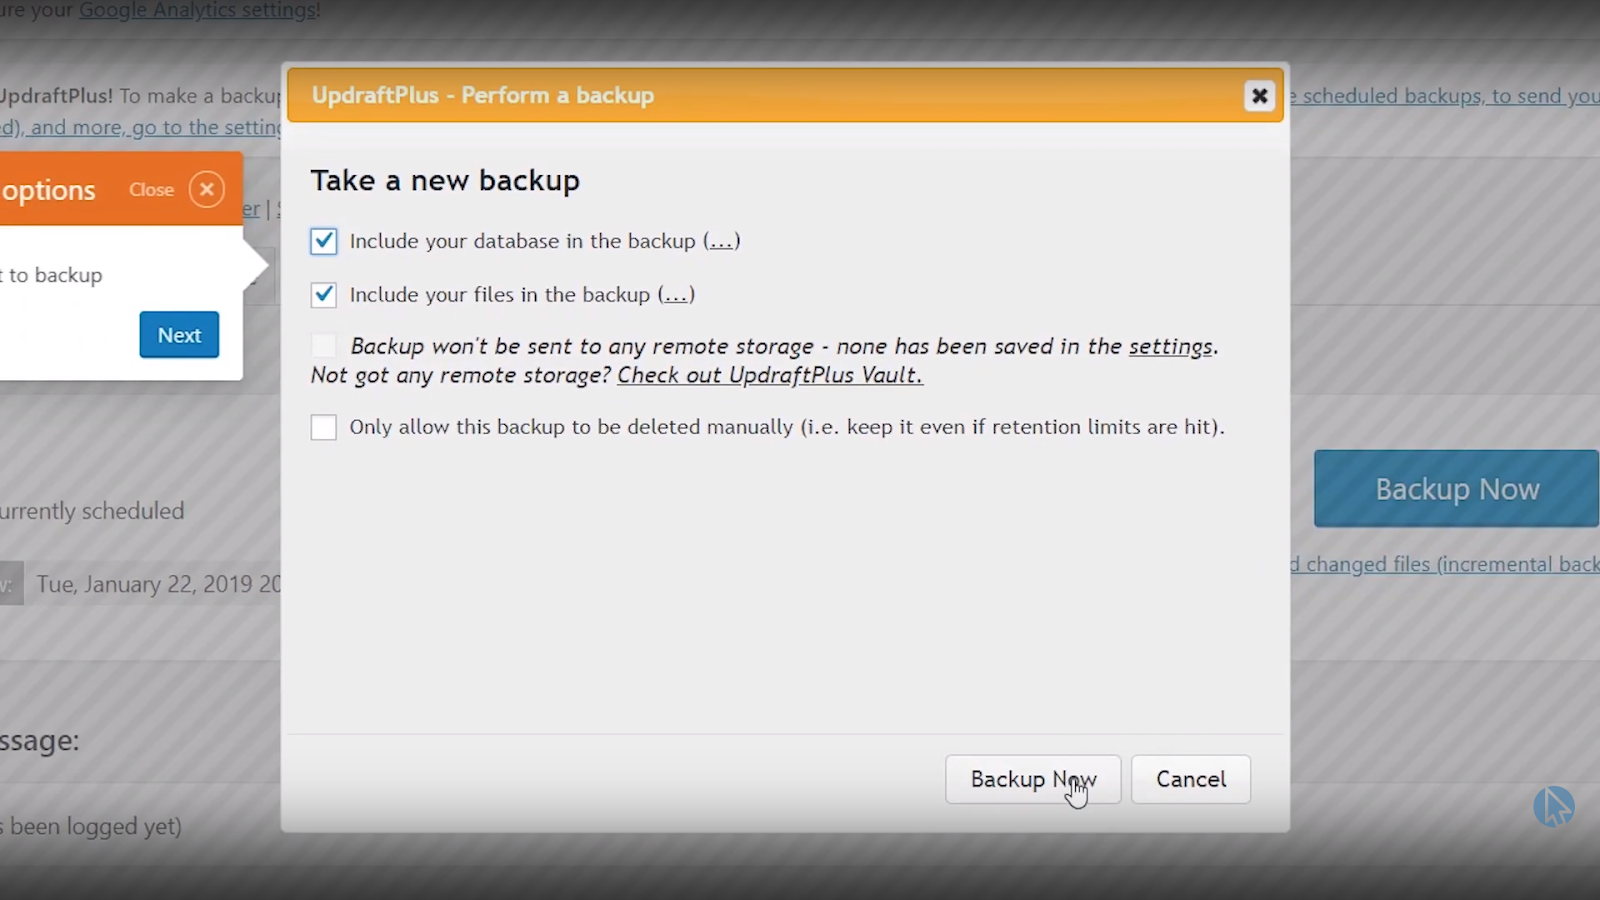 updraftplus wordpress database backup now